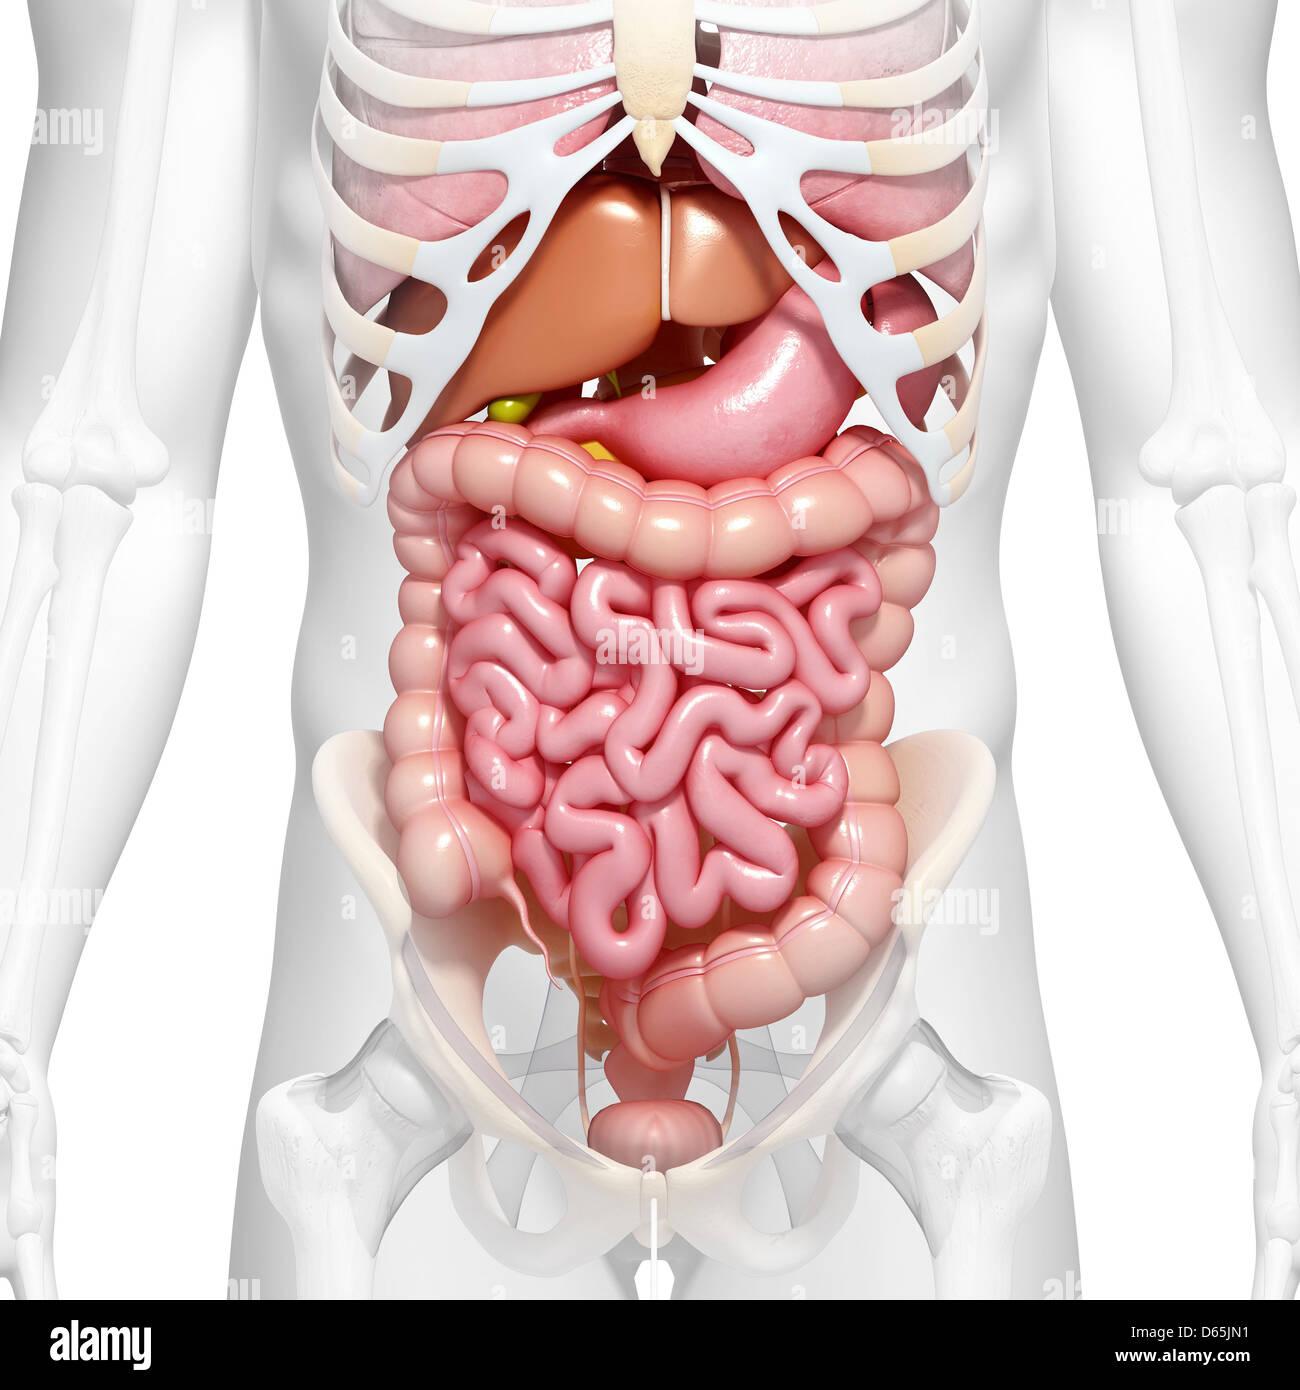 Abdominal Anatomy Stock Photos Abdominal Anatomy Stock Images Alamy